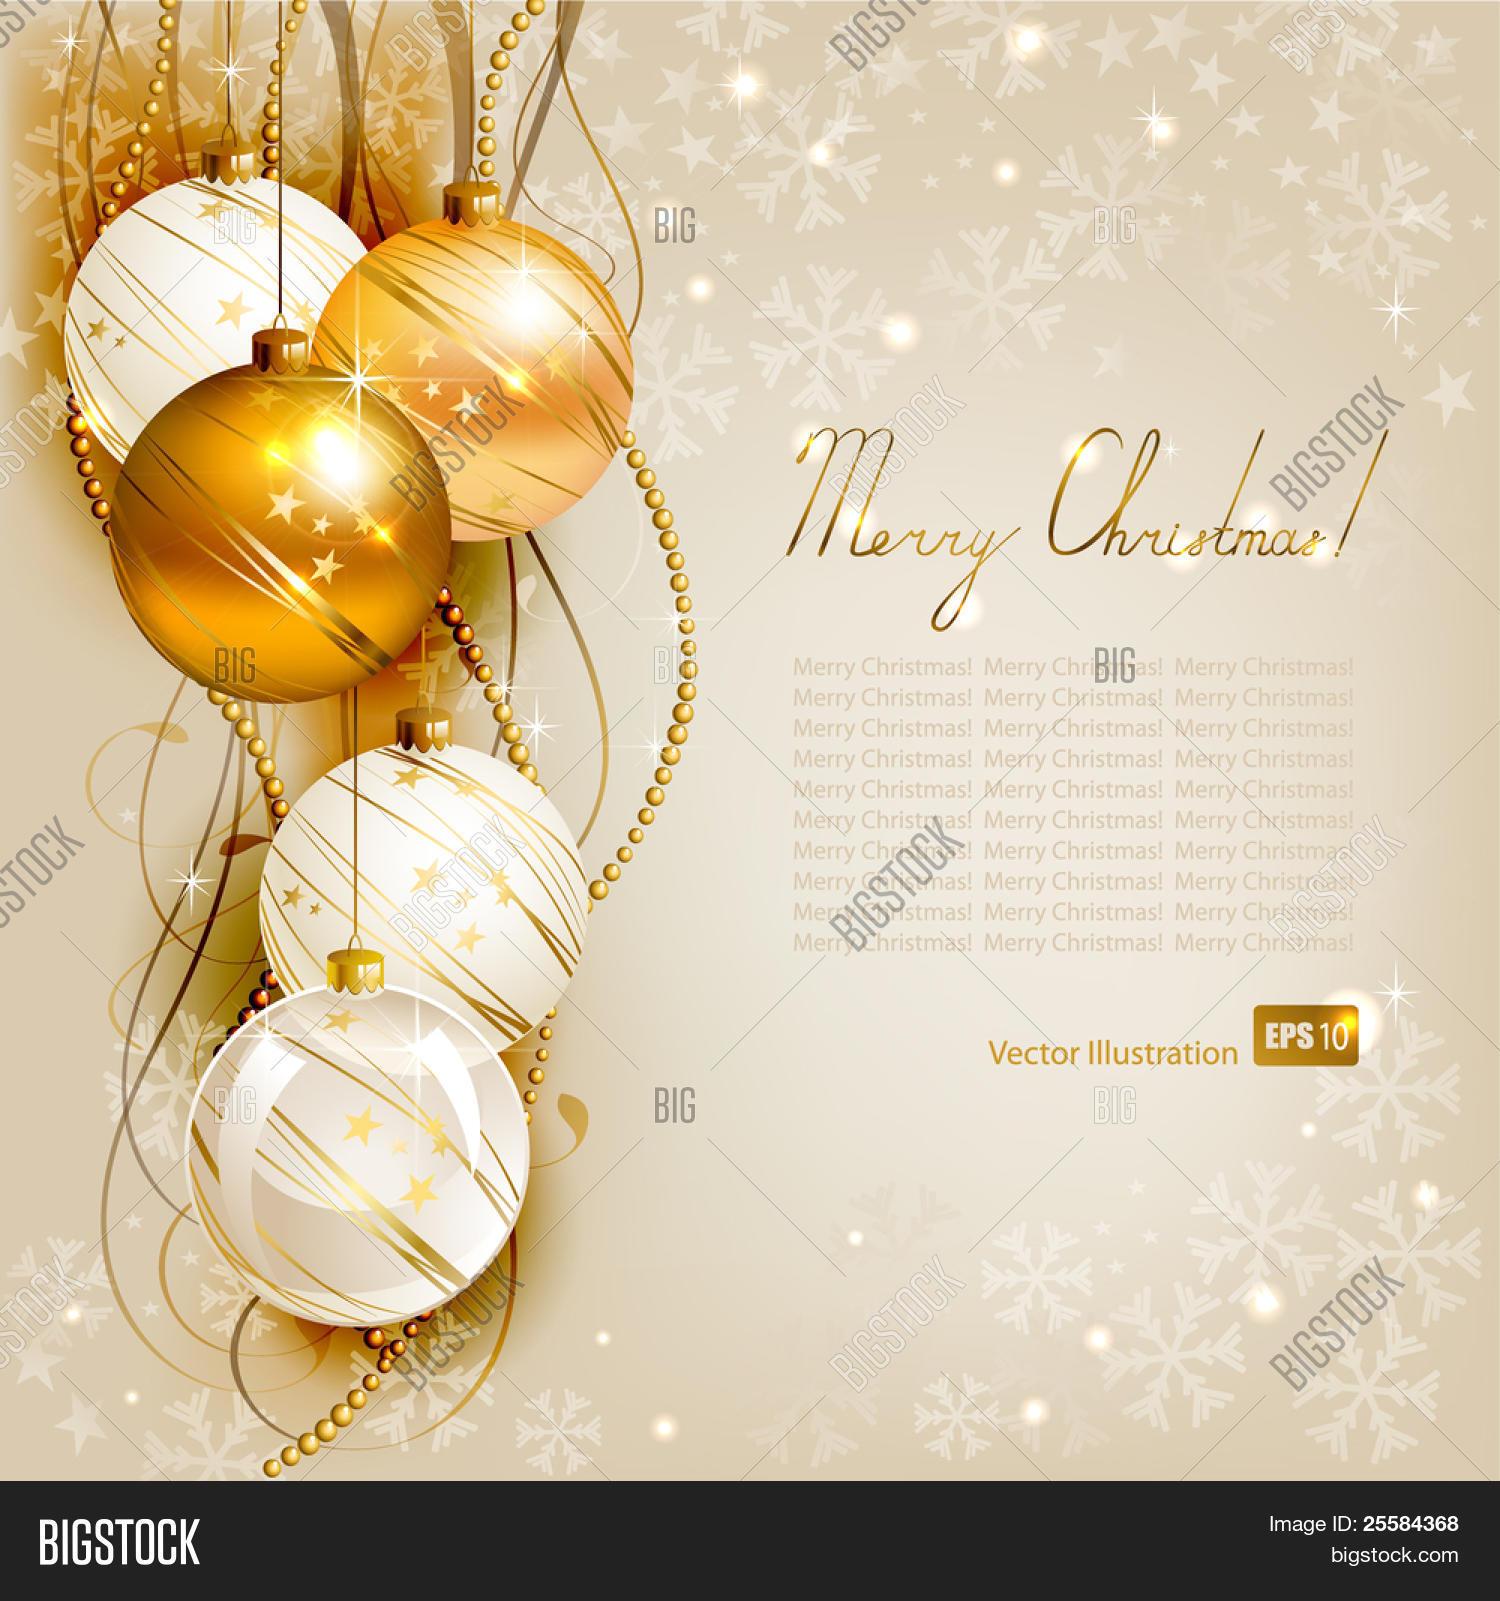 Elegant Christmas Background Hd.Elegant Christmas Vector Photo Free Trial Bigstock